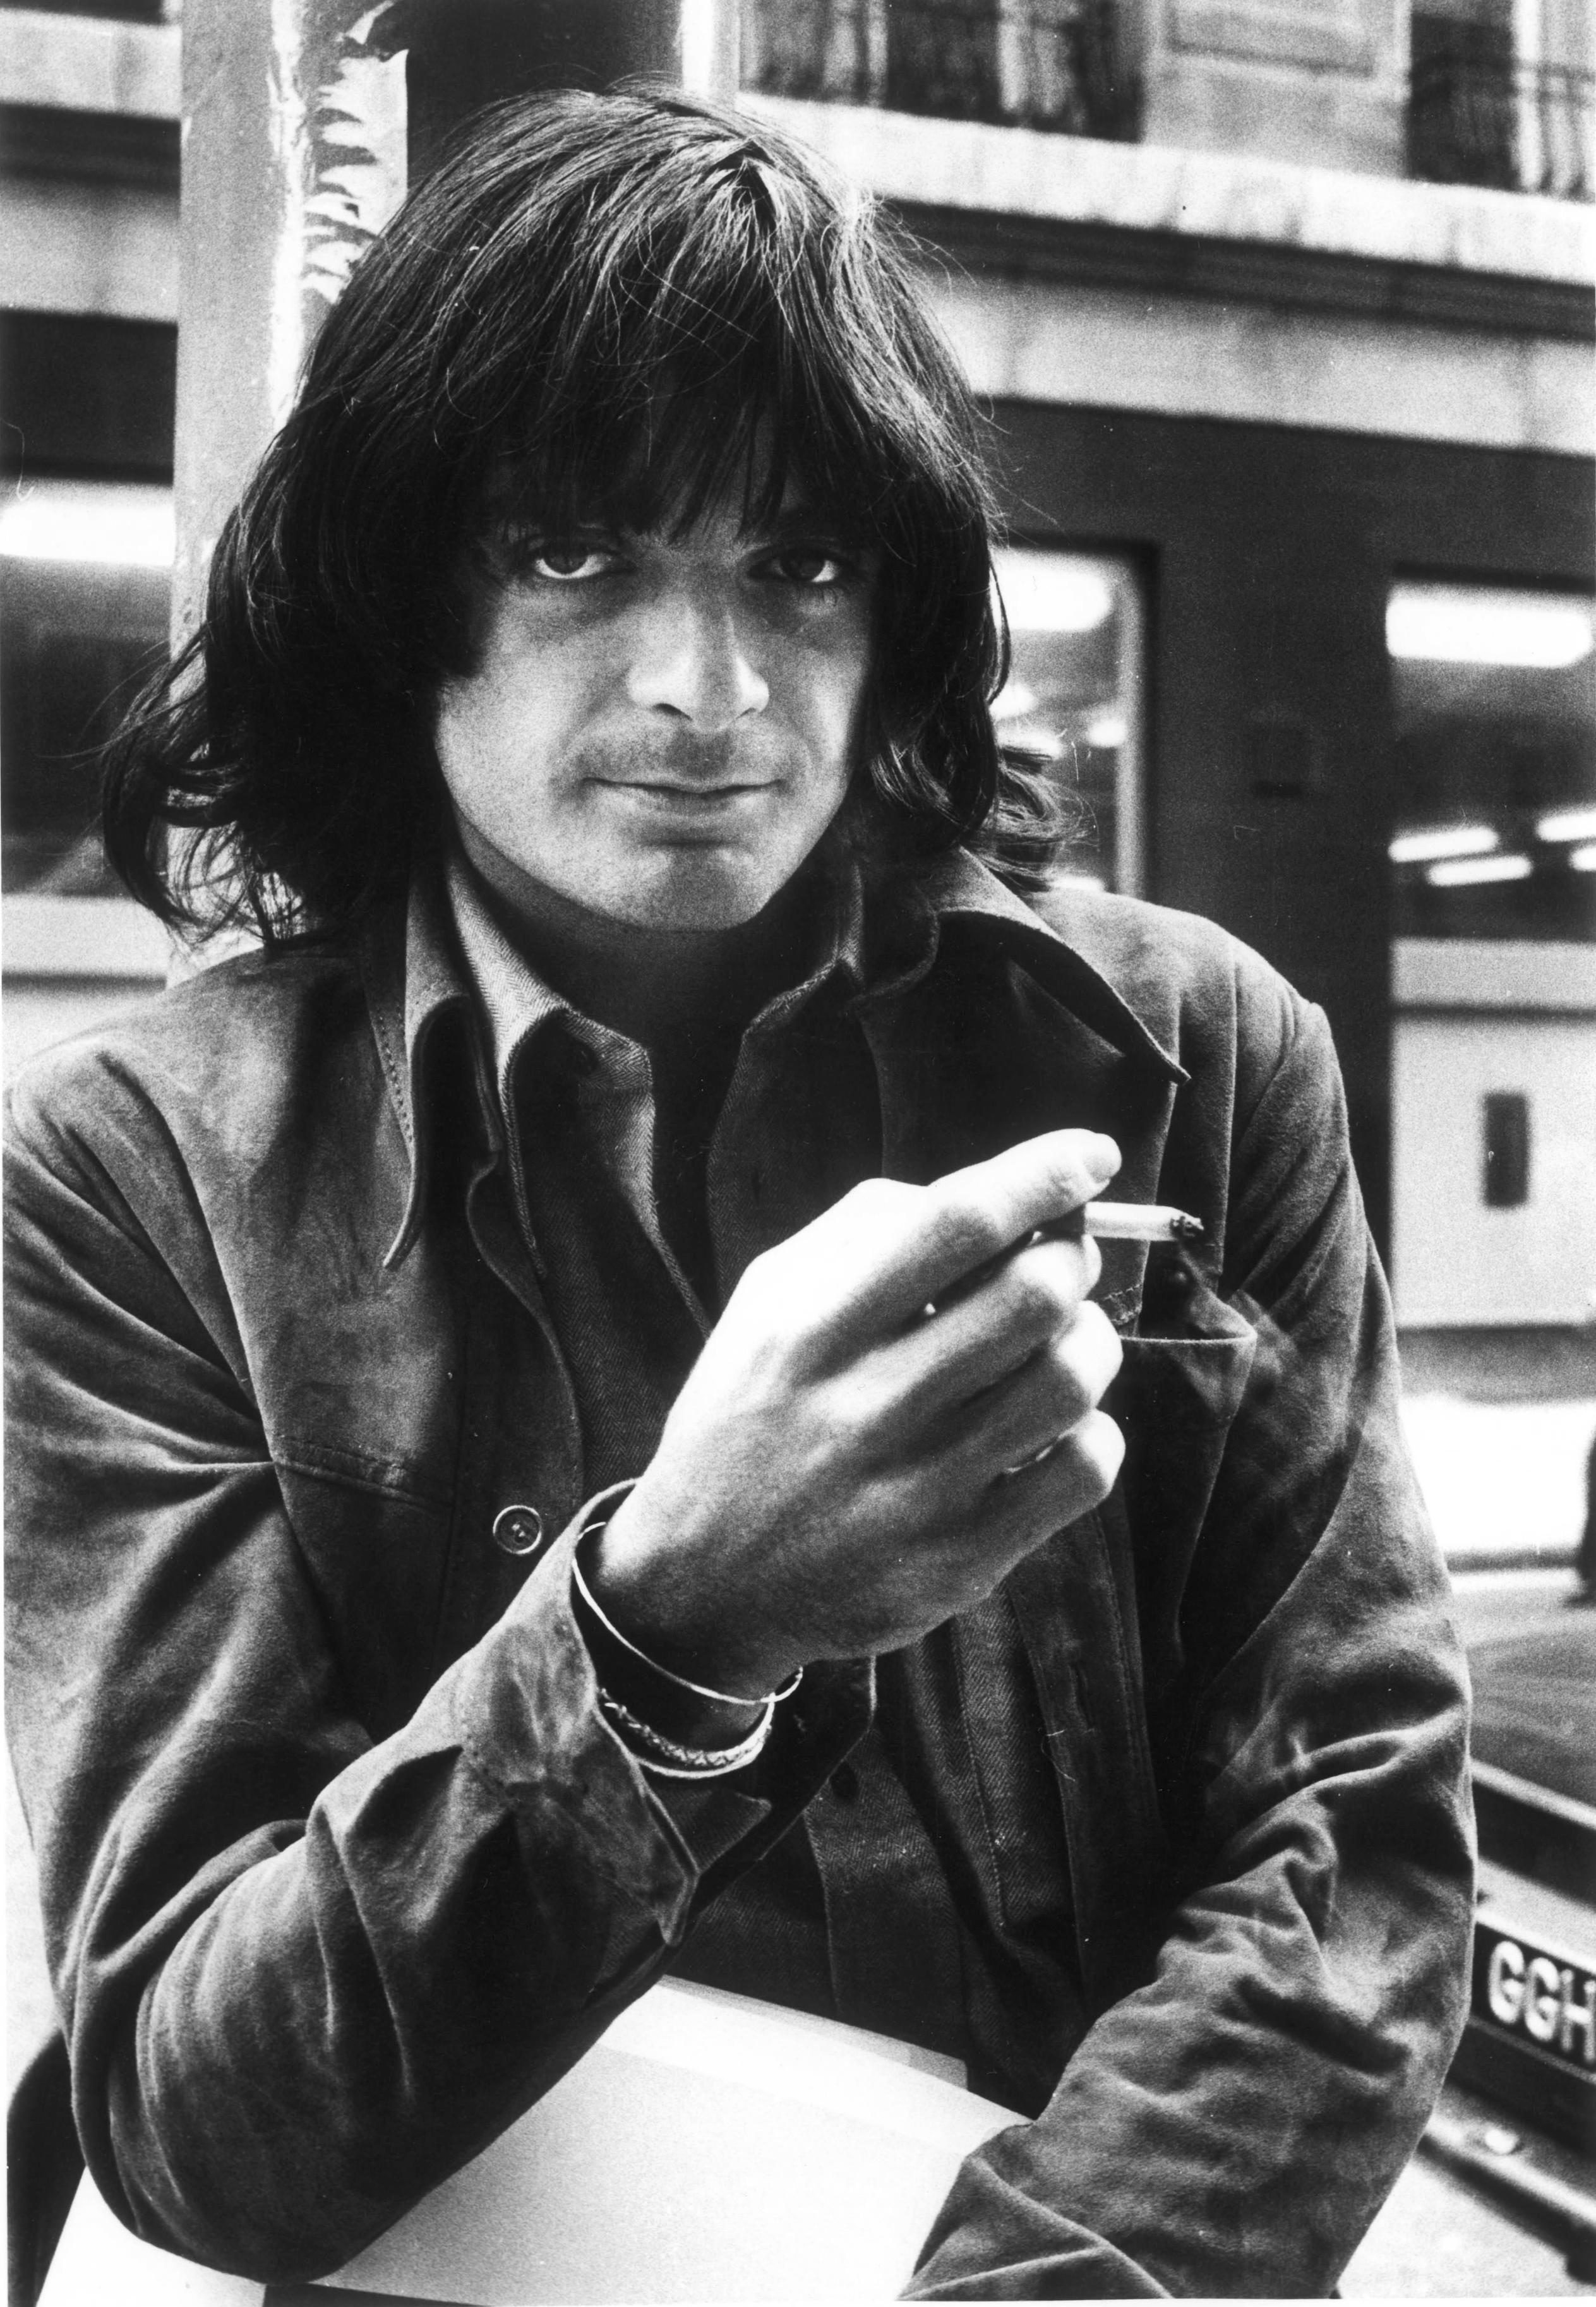 Dallas Taylor in London circa 1973.